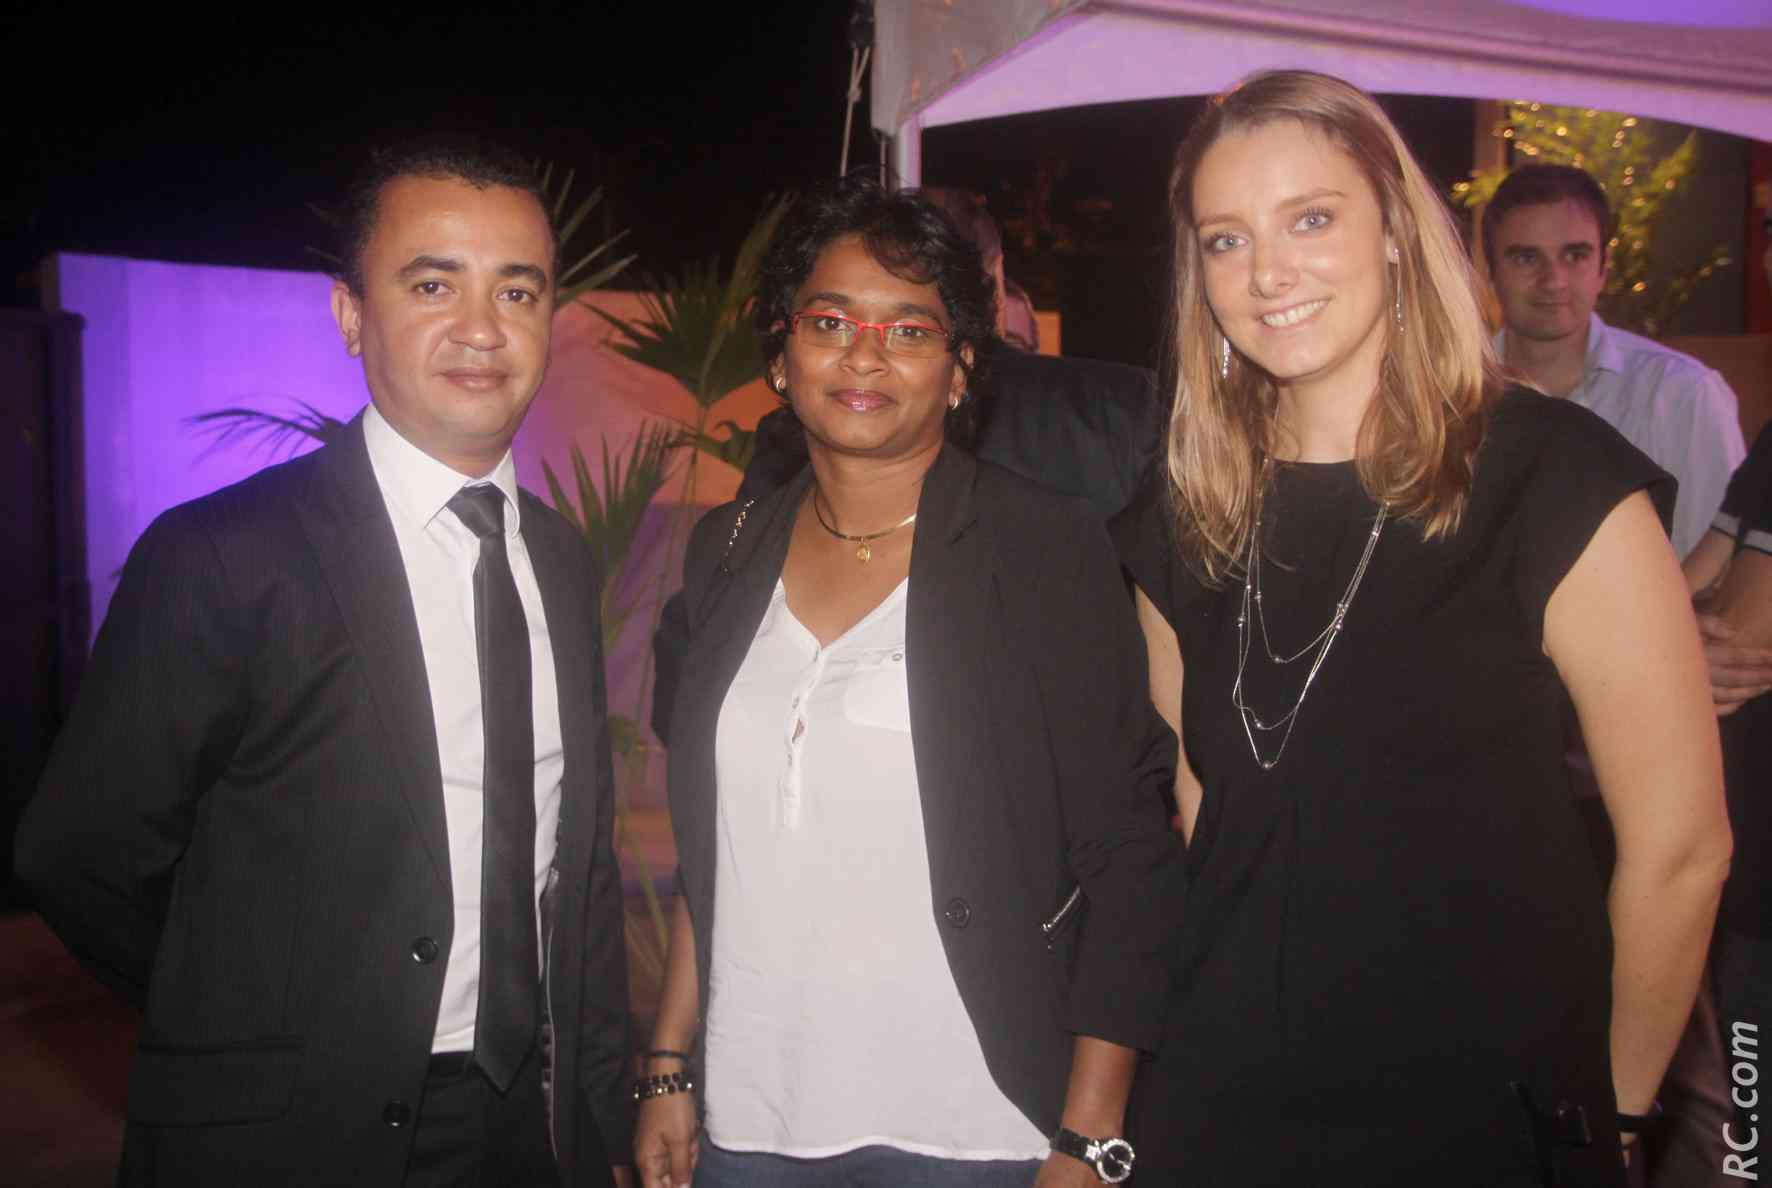 Didier Radavidra, Emmanuelle Hoarau, Deputy General Manager CMA CGM, et Aurélie Noëlle de l'Agence Didier Radavidra